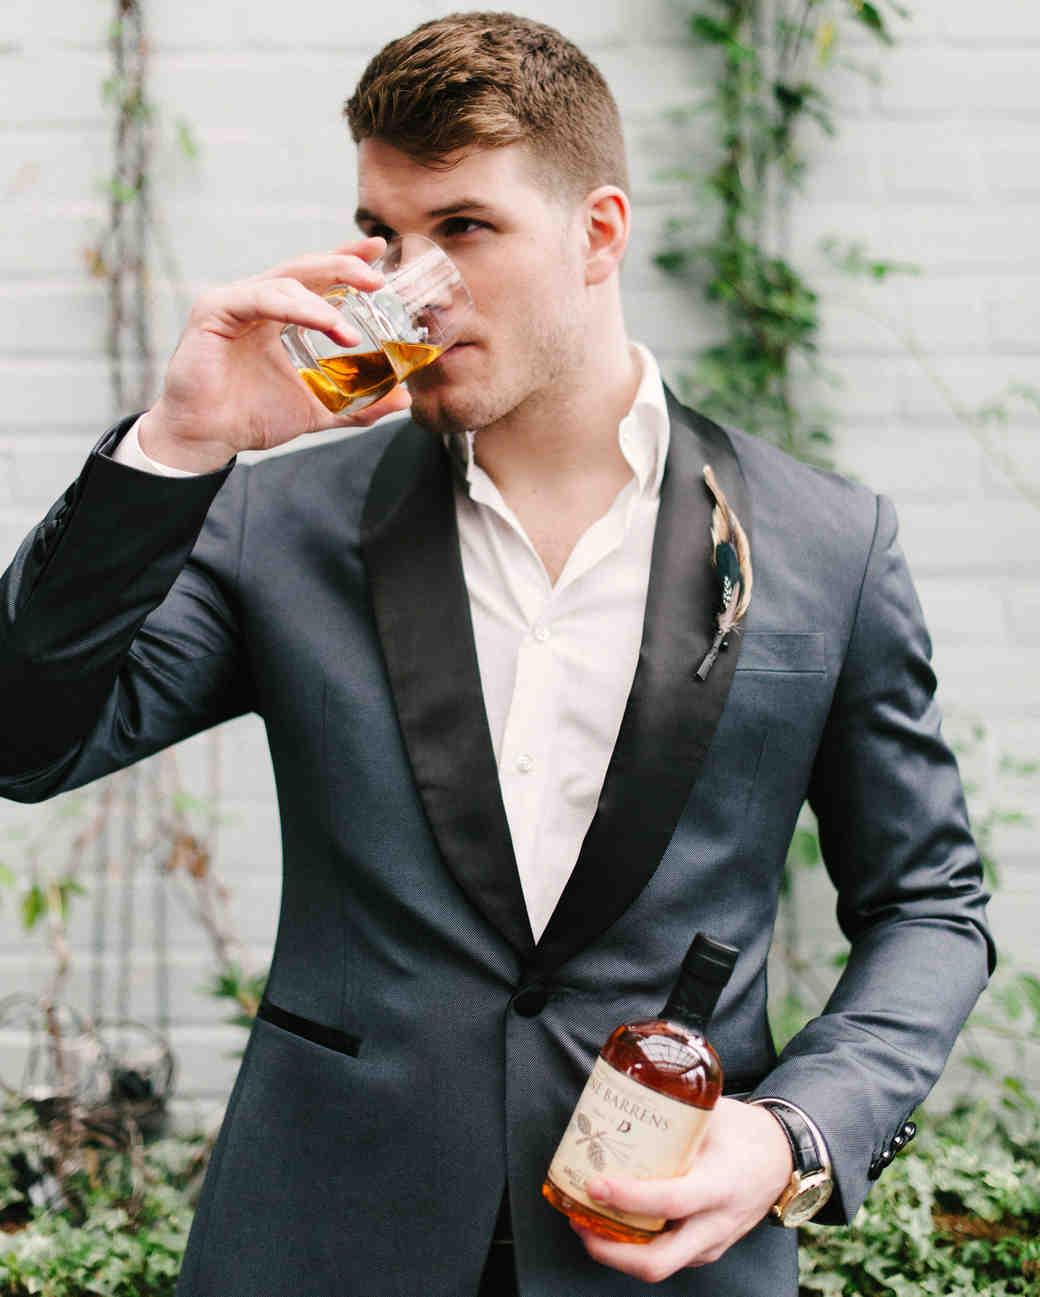 mens-getting-ready-guide-drink-0715.jpg